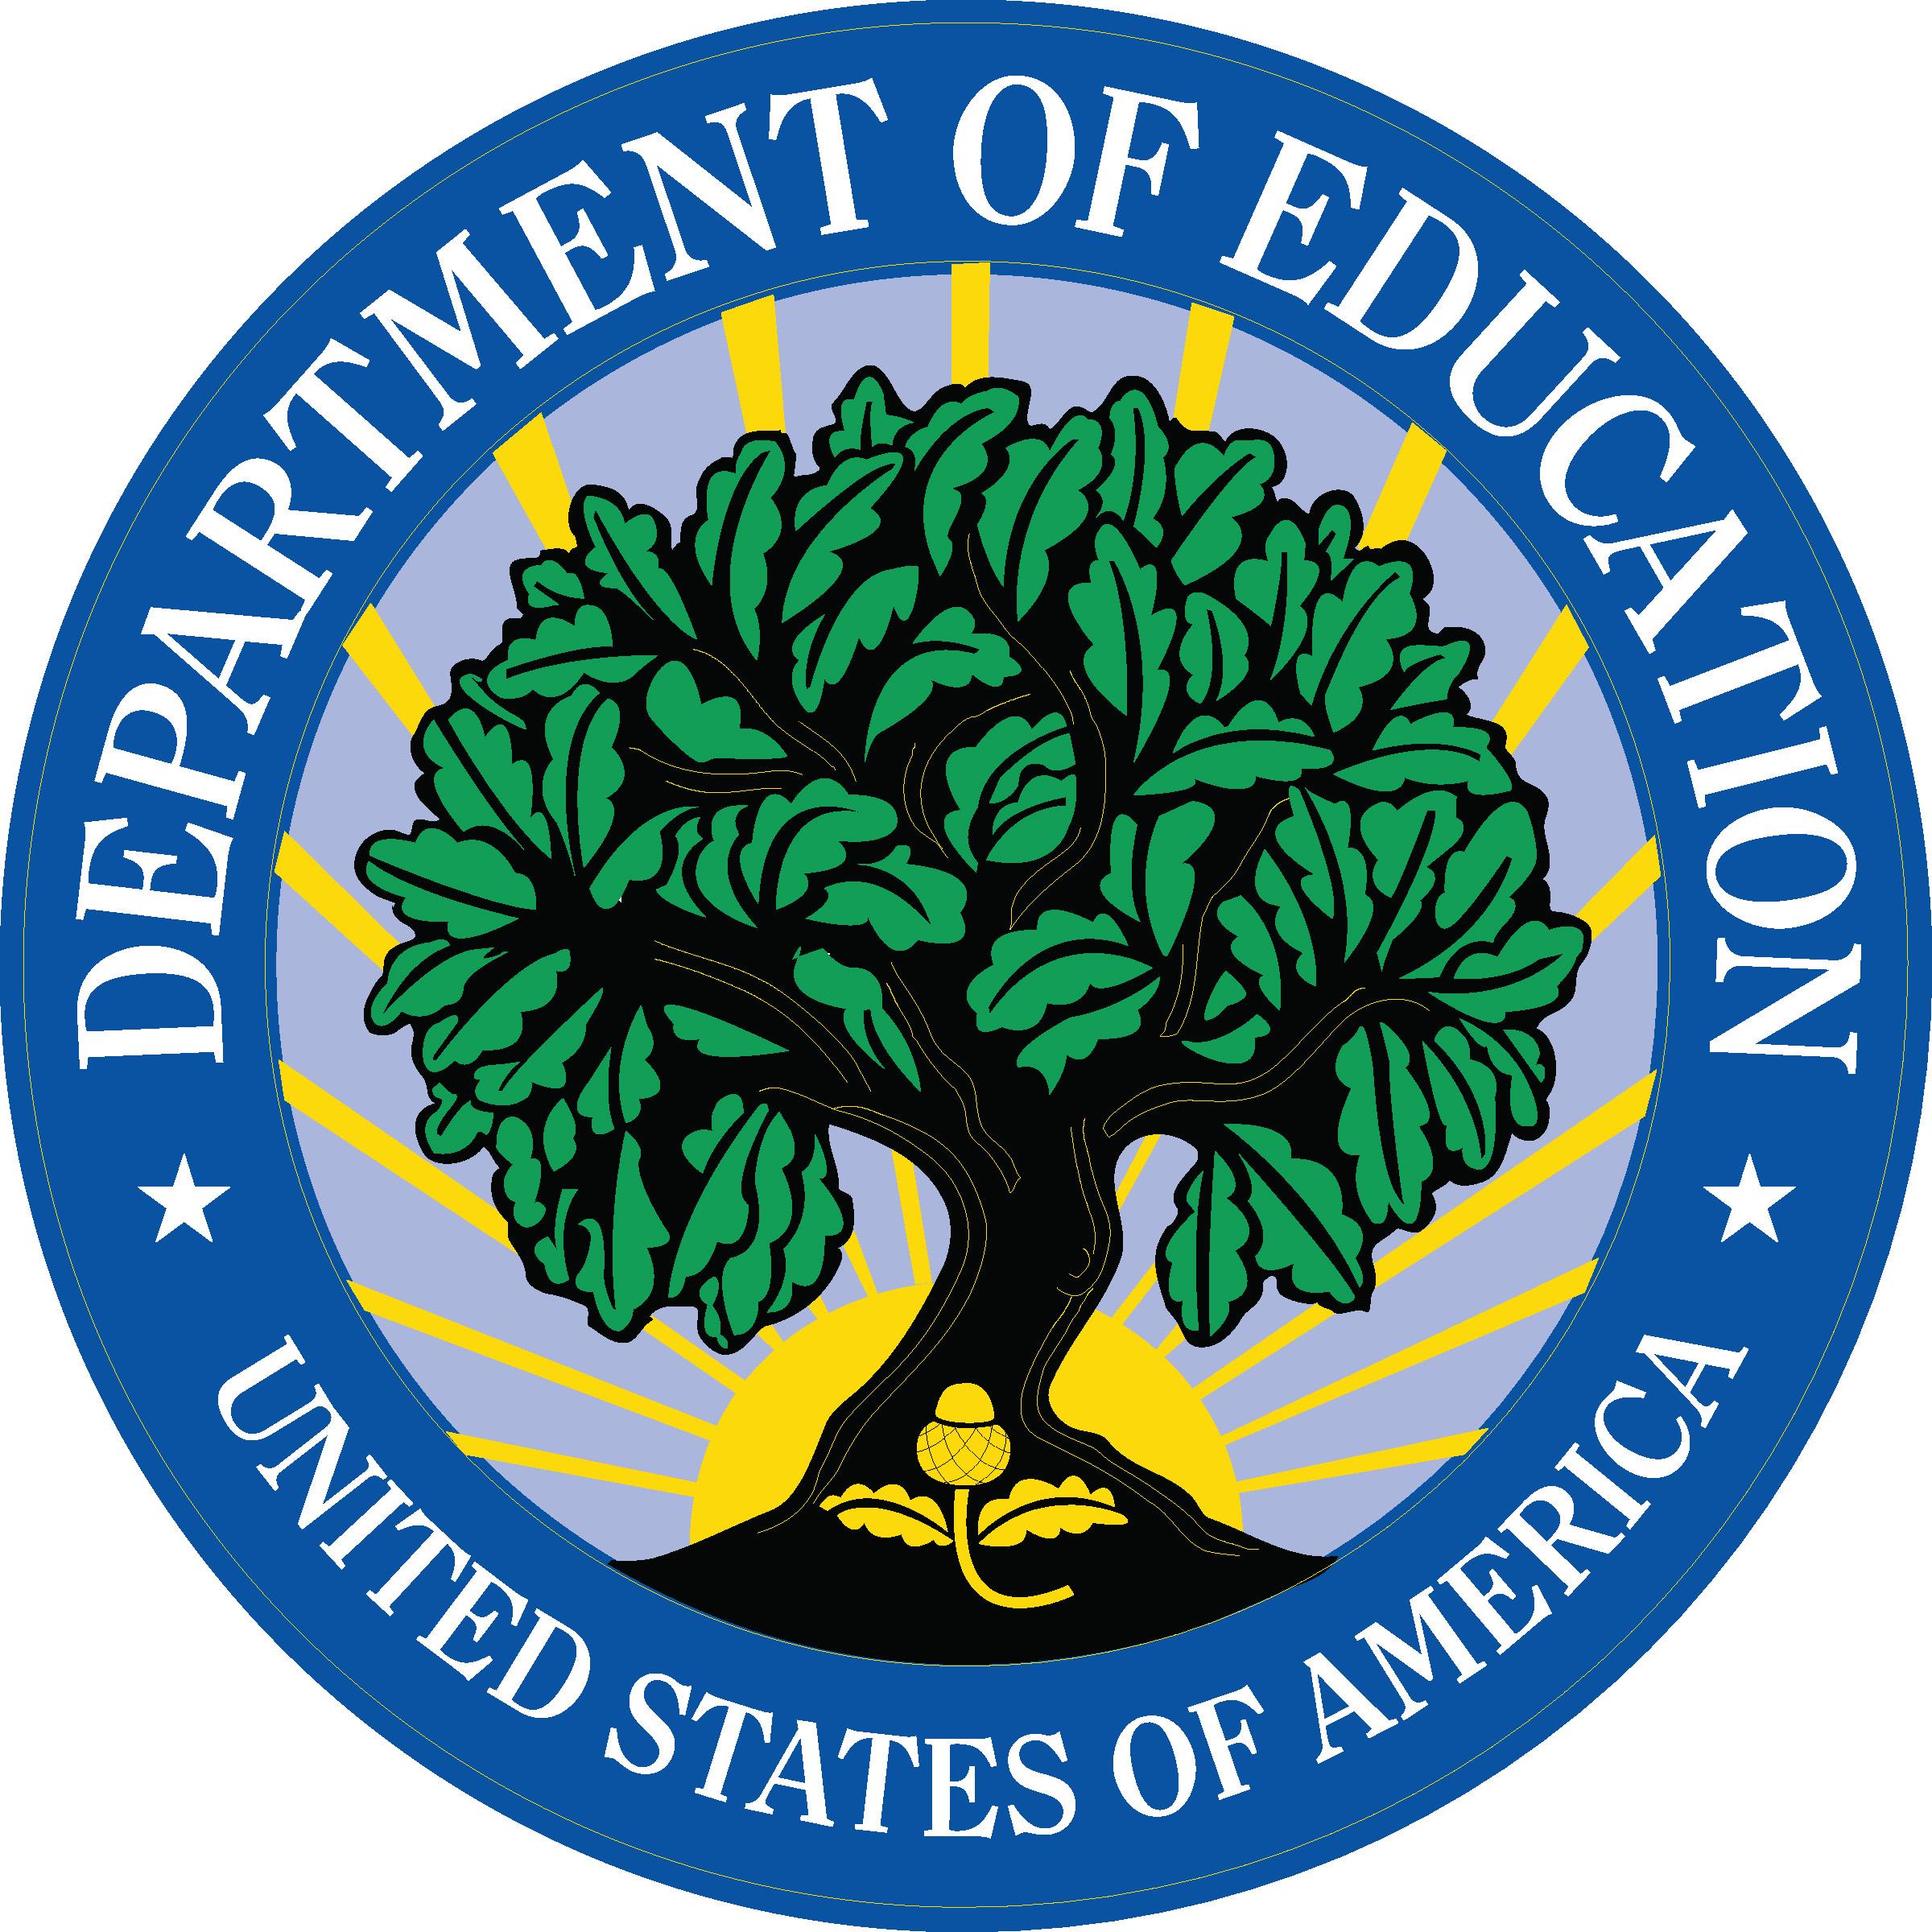 dept_of_education_logo copy copy.jpg